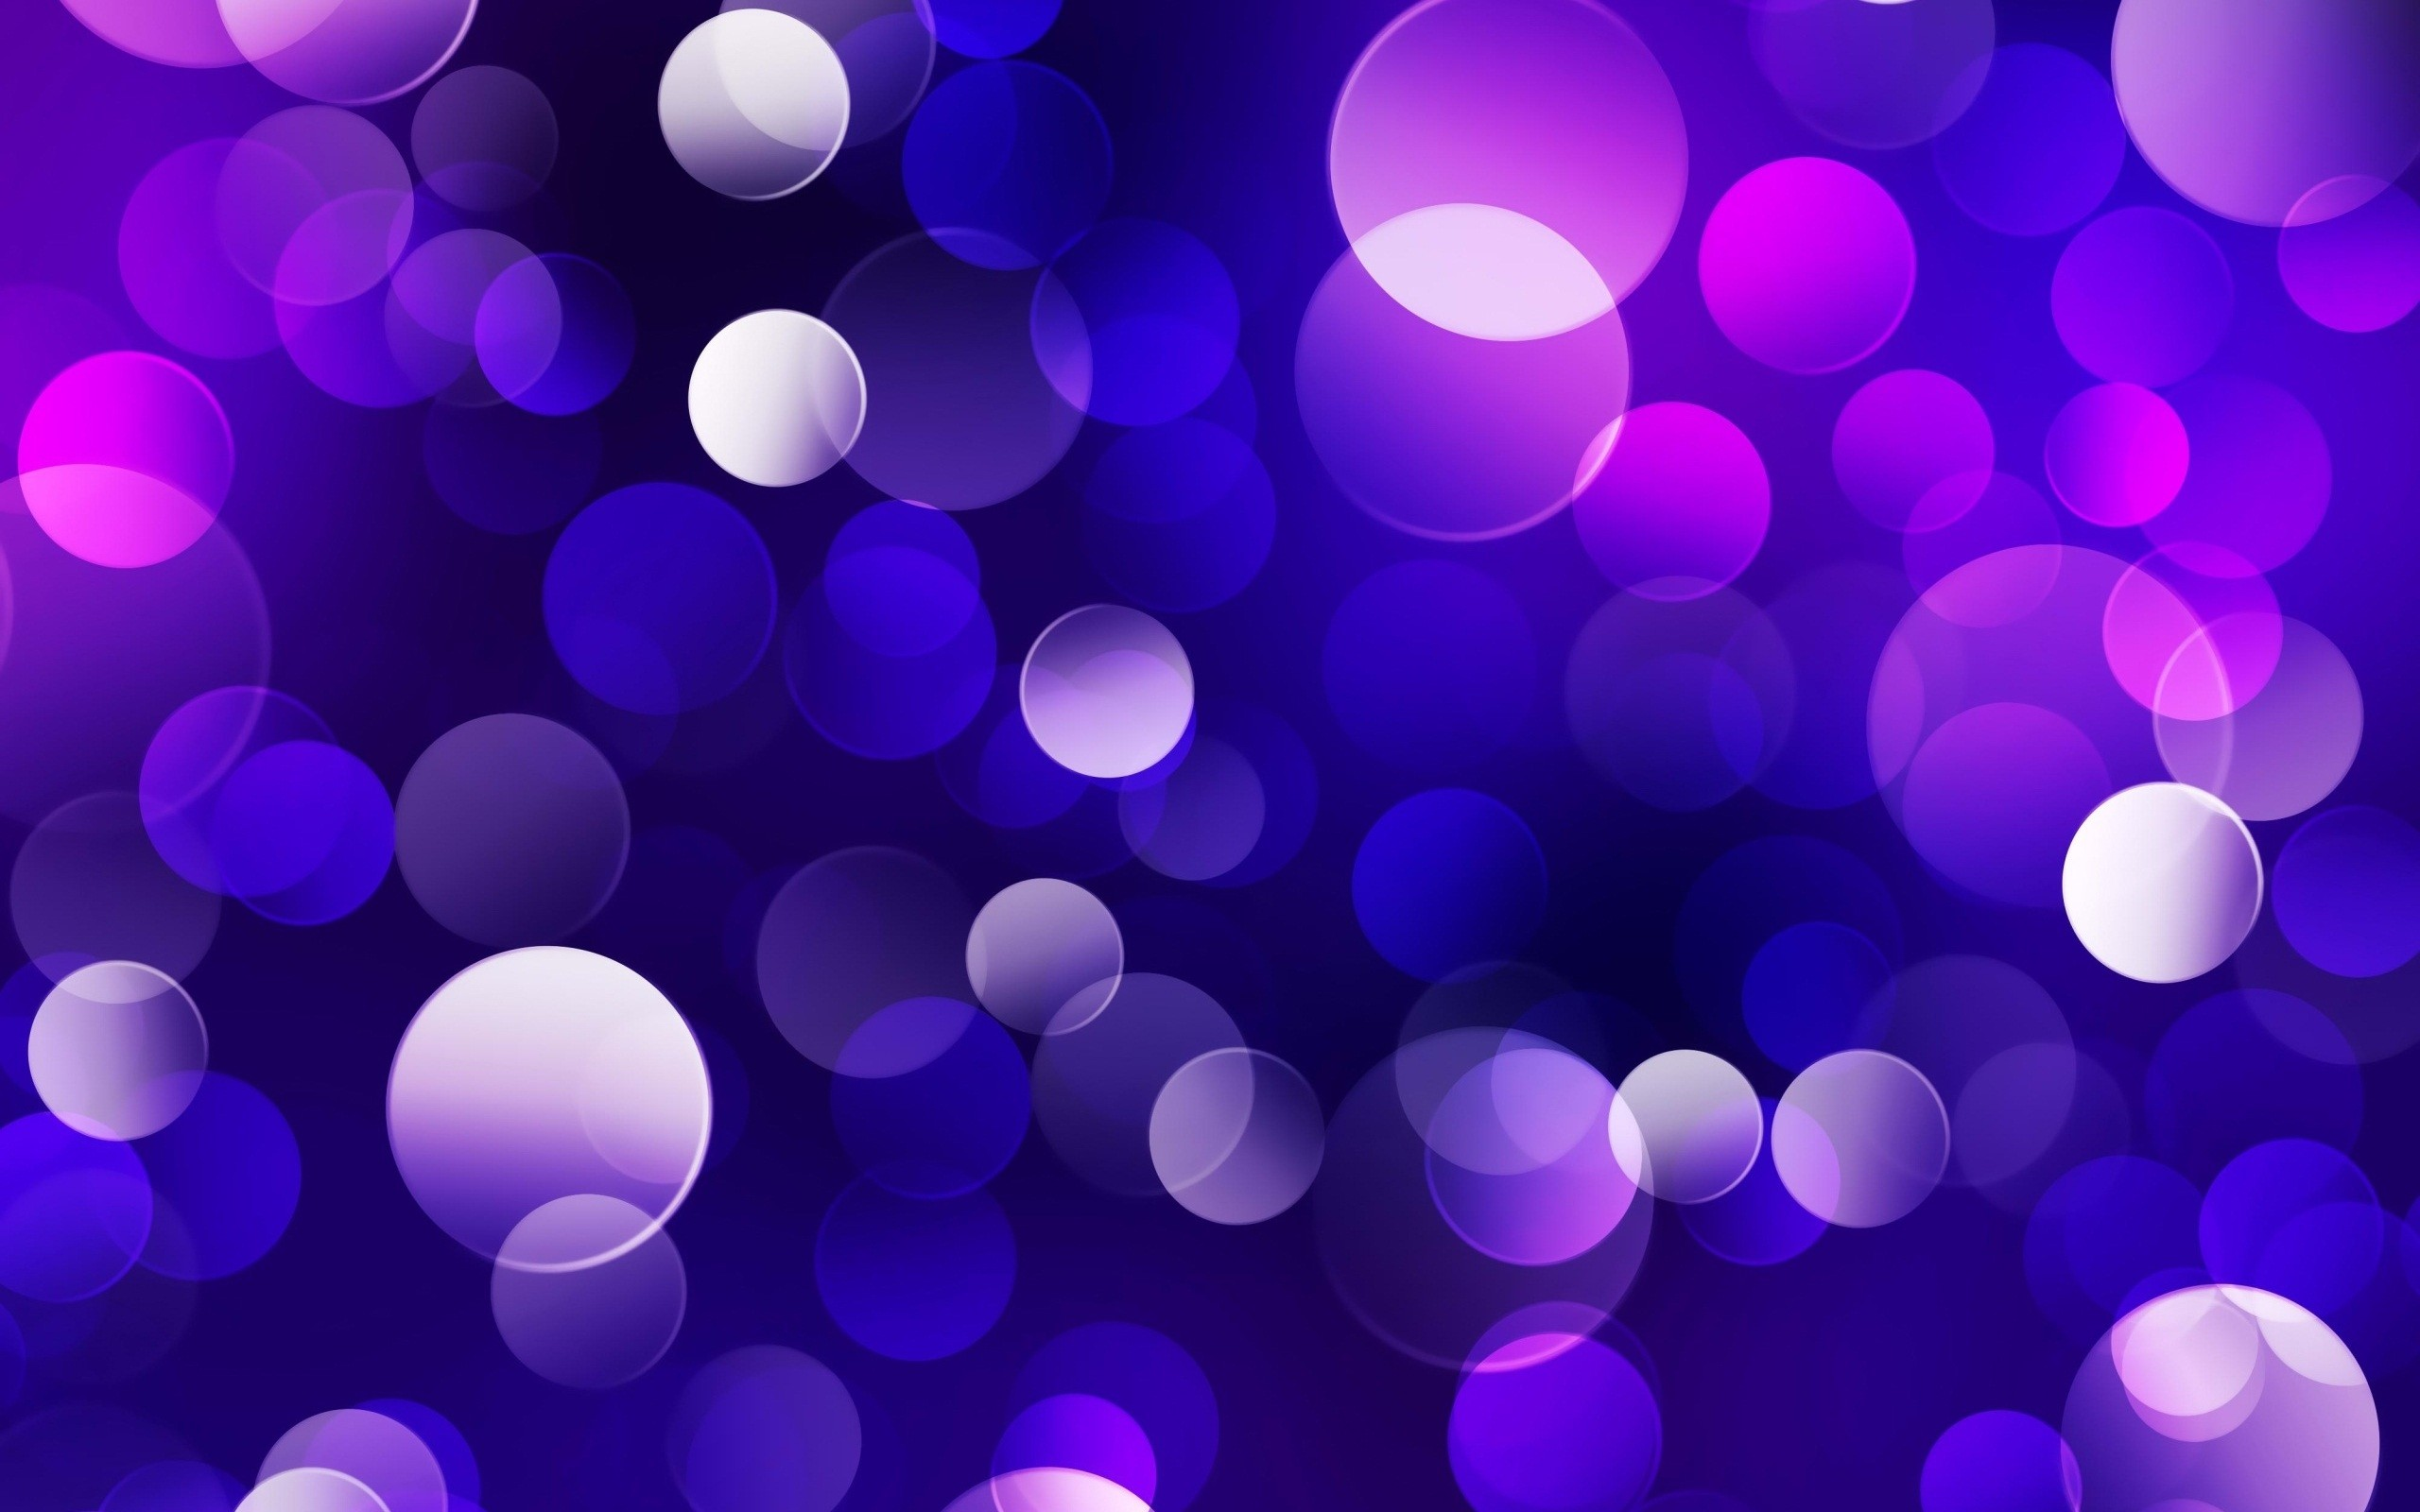 Purple abstract wallpaper widescreen desktop mobile iphone android hd  wallpaper and desktop.